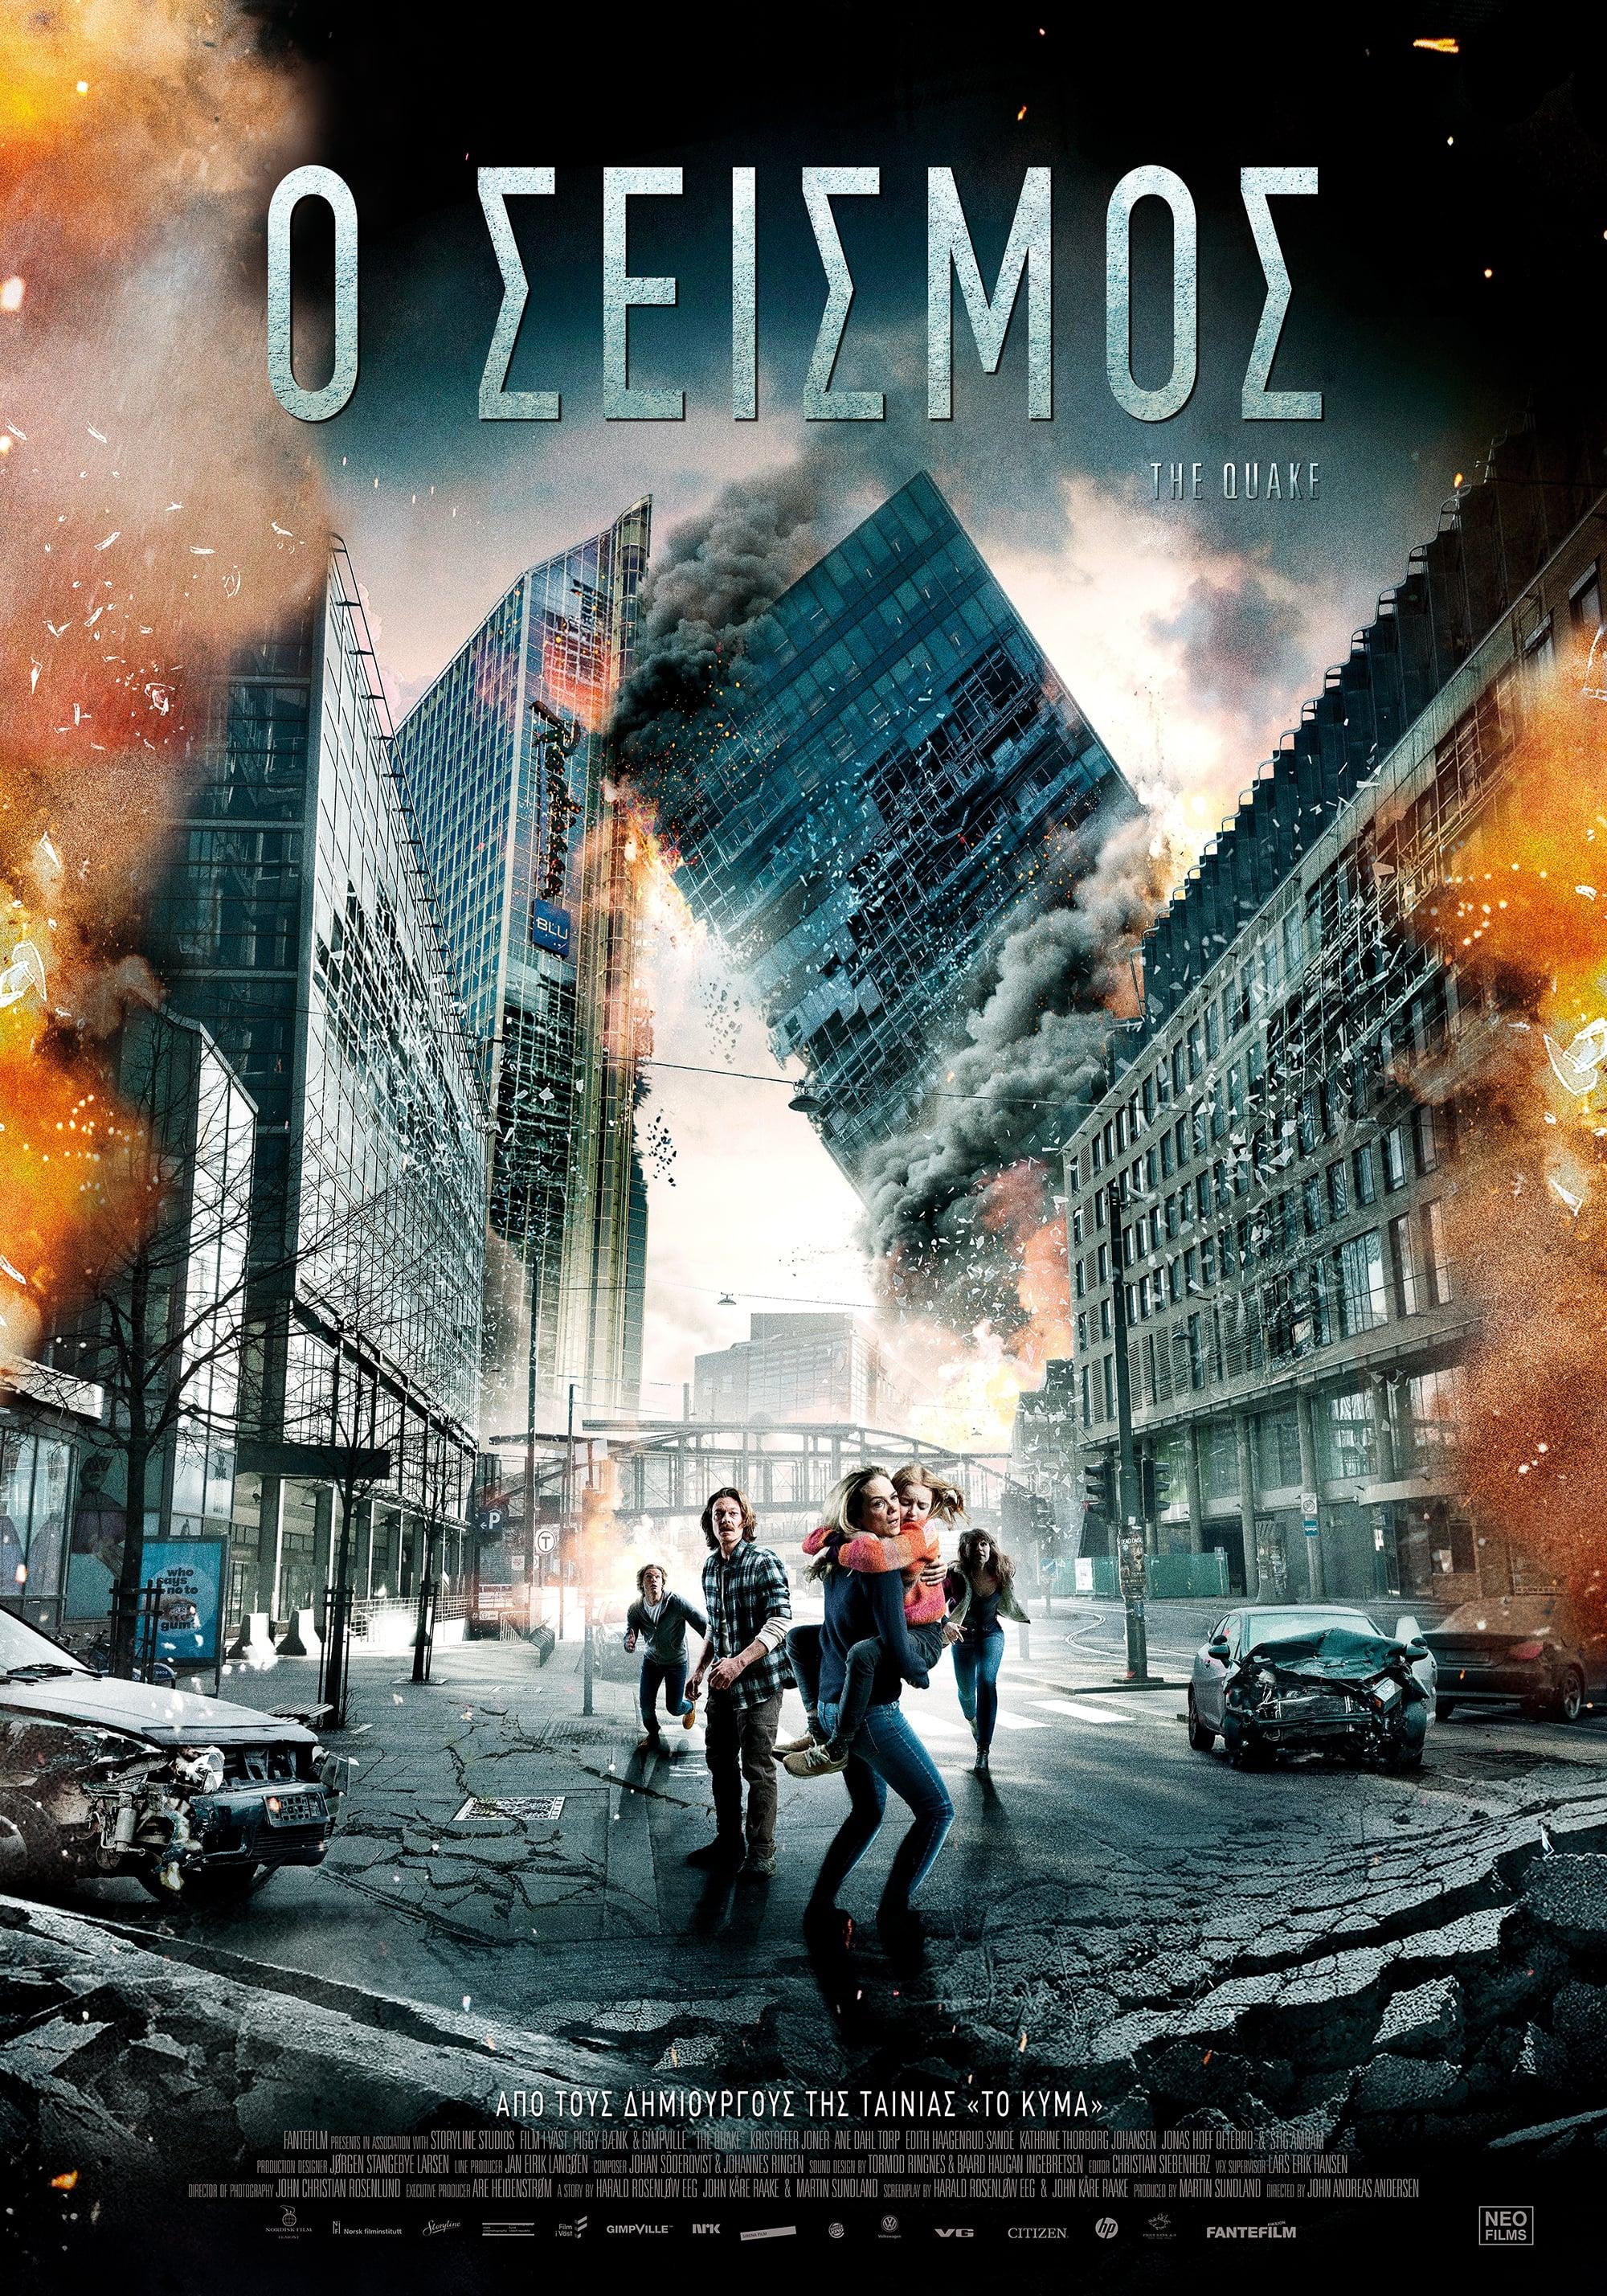 The Quake มหาวิบัติแผ่นดินถล่มโลก (2018)